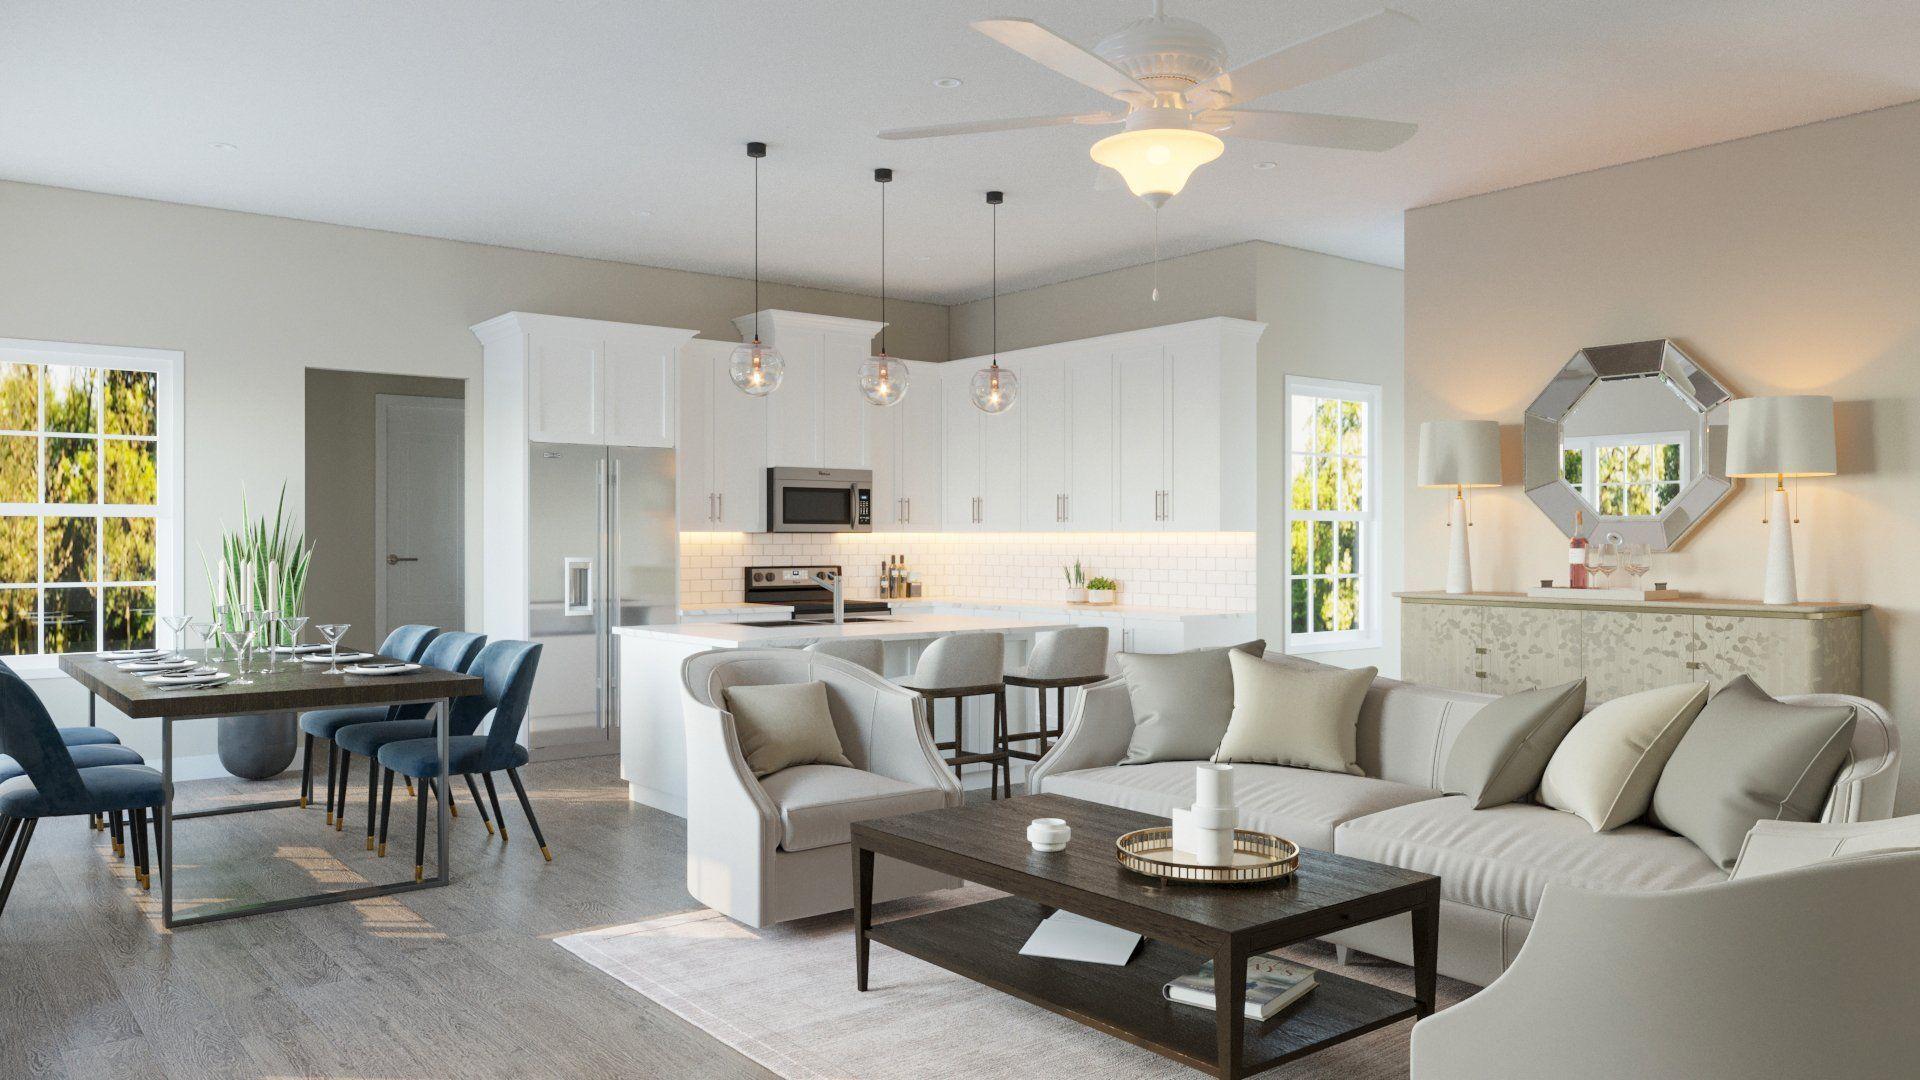 a modern living room with hard wood floors